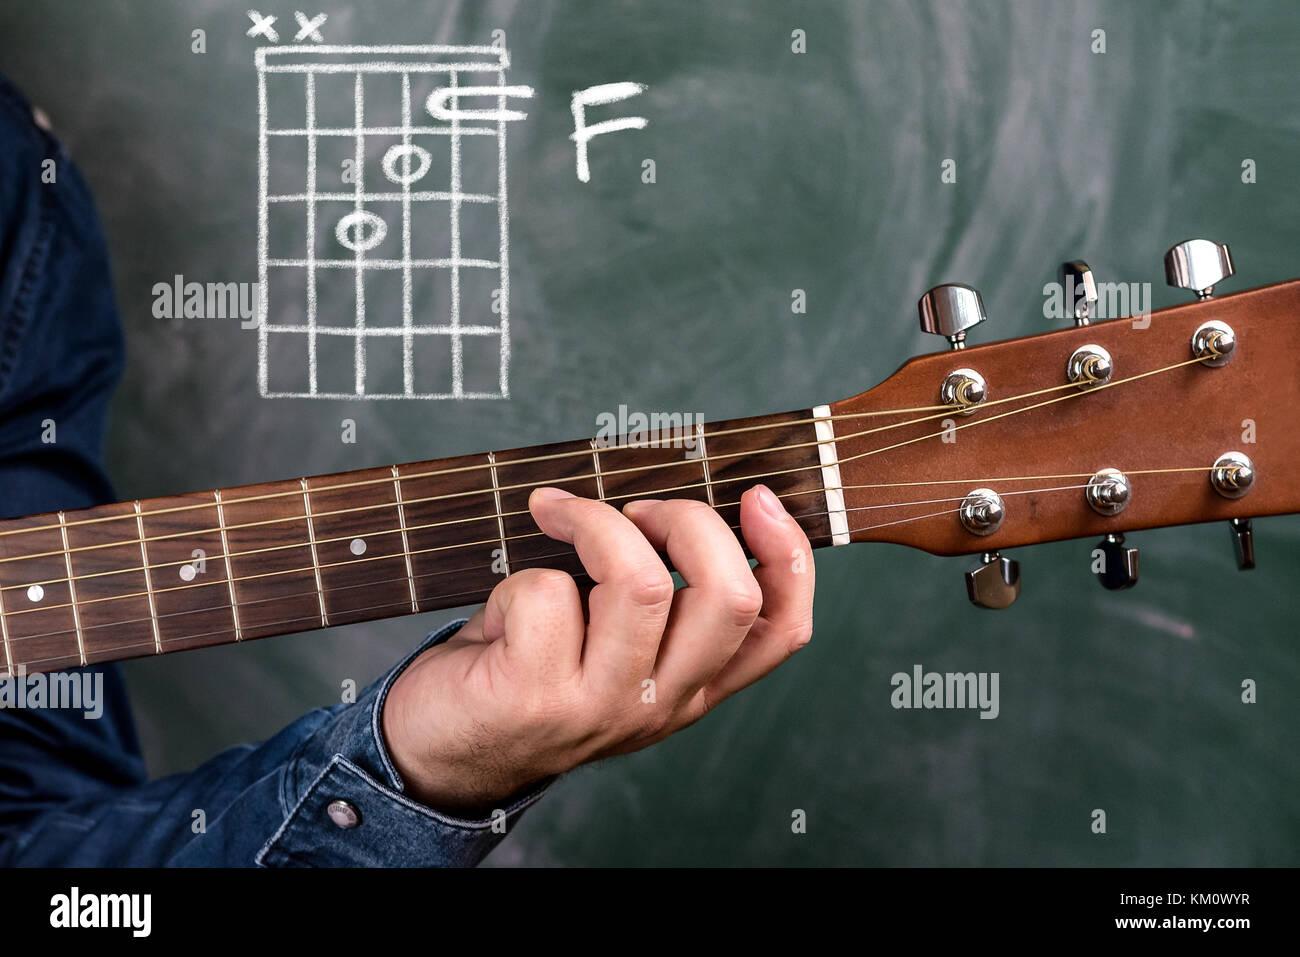 Fingers On Guitar Strings Stock Photos Fingers On Guitar Strings